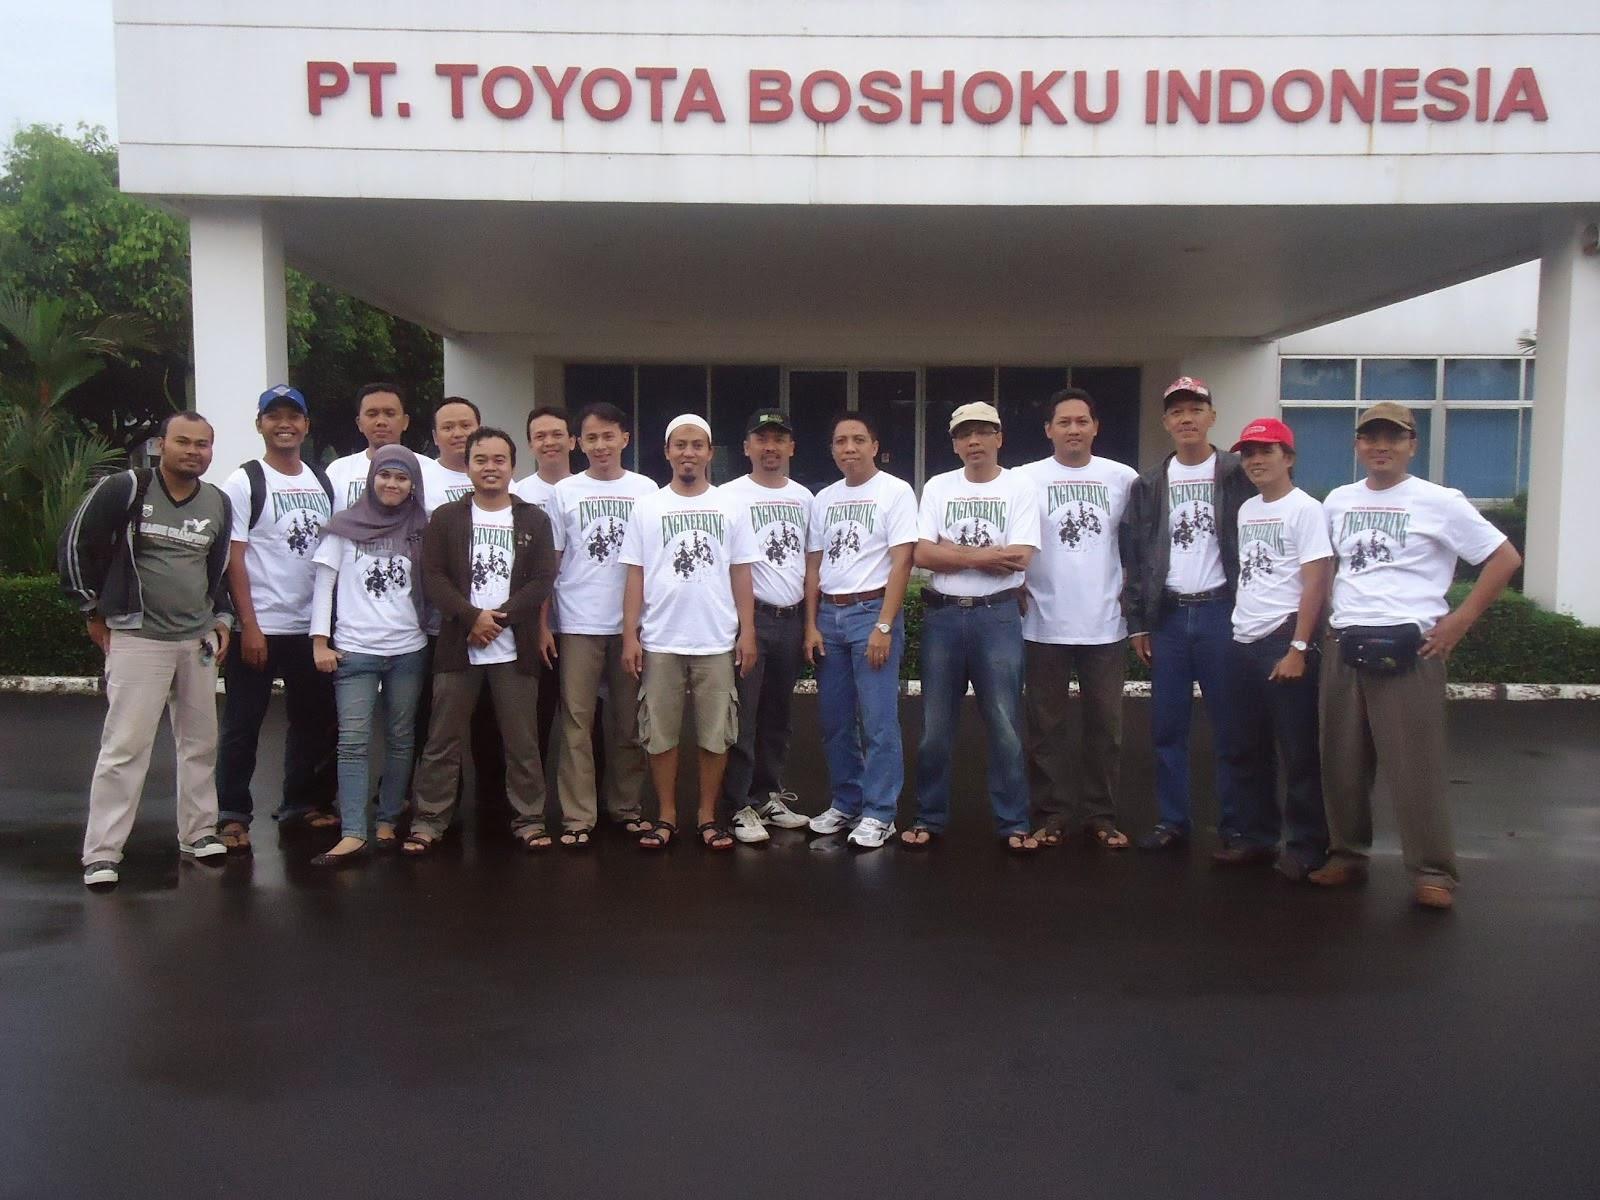 Loker Di Kawasan Mm 2013 Lowongan Kerja Pt Kereta Api Persero Loker Cpns Bumn Lowongan Kerja Bulan Mei Juni 2015 Pt Toyota Boshoku Indonesia